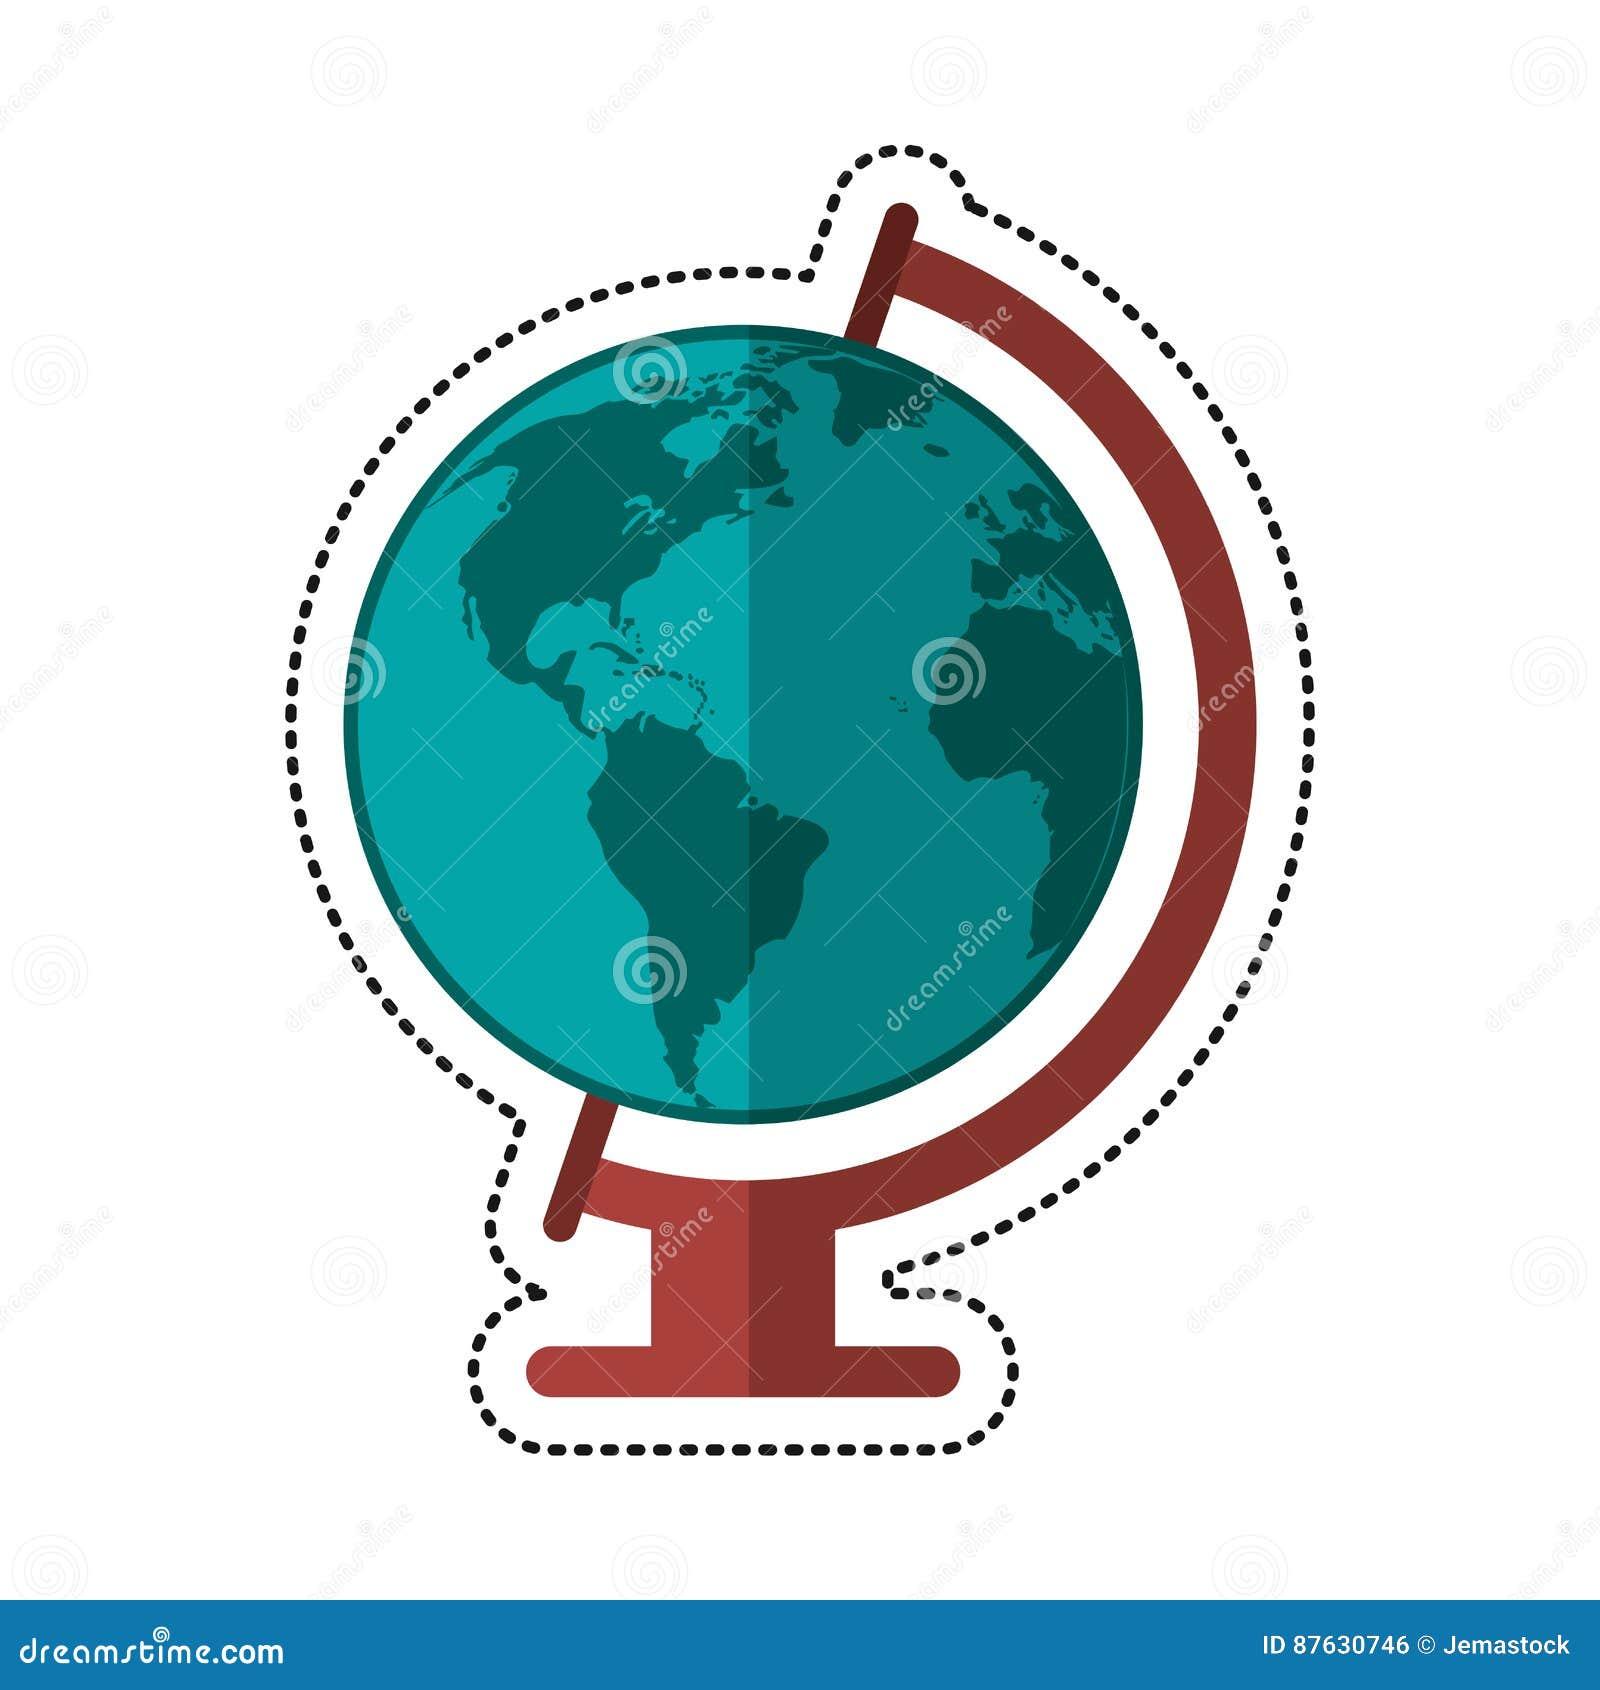 Cartoon globe world map icon stock illustration illustration of download cartoon globe world map icon stock illustration illustration of icon environment 87630746 gumiabroncs Gallery